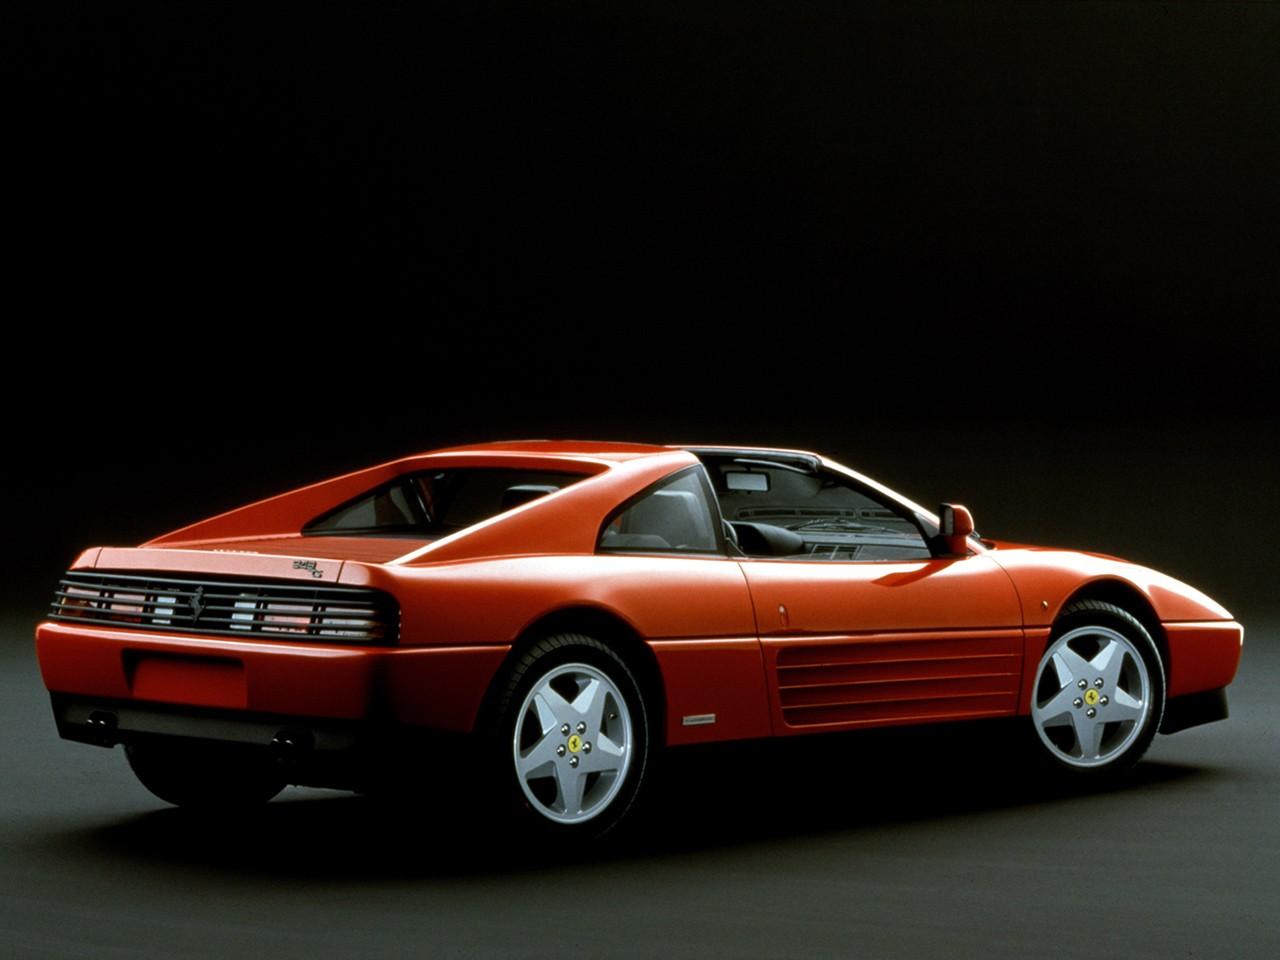 1989, 1990, 1991, 1992, 1993